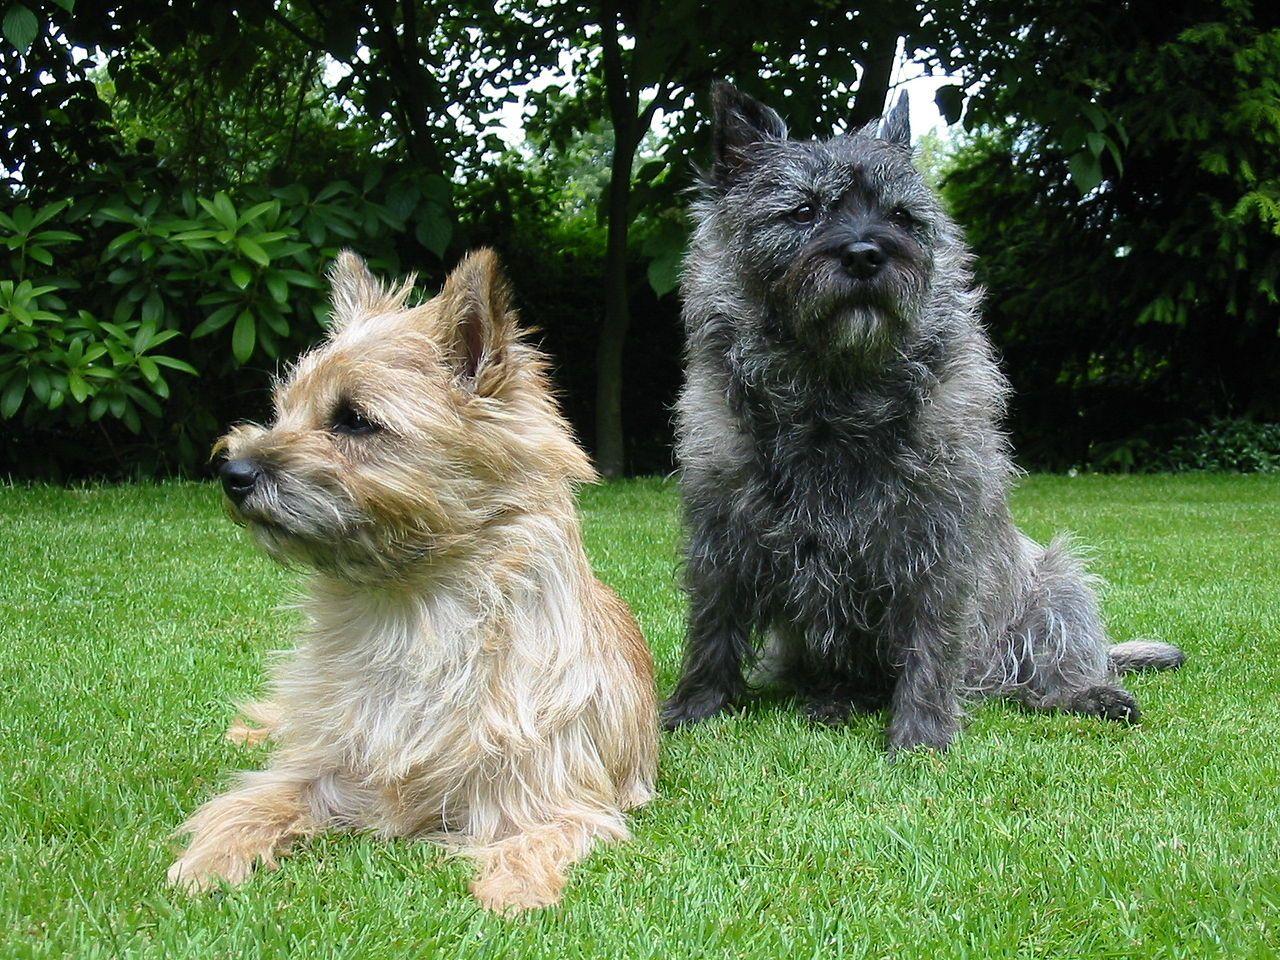 Cairn Terrier Wikipedia Cairn Terrier Puppies Terrier Breeds